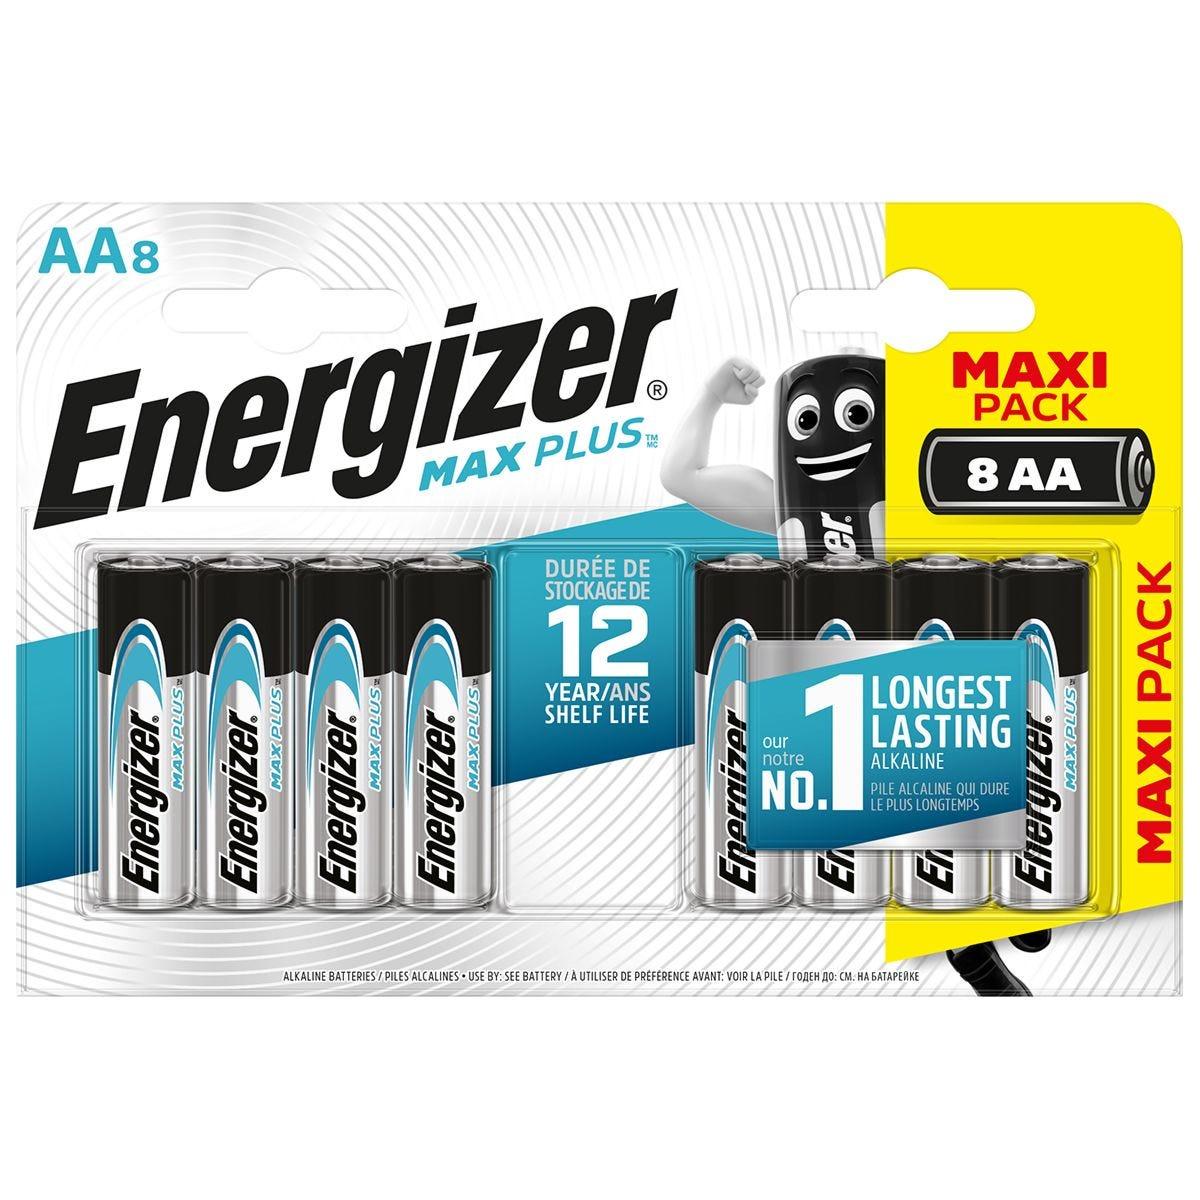 Energizer Max Plus AA Batteries 8 Pack